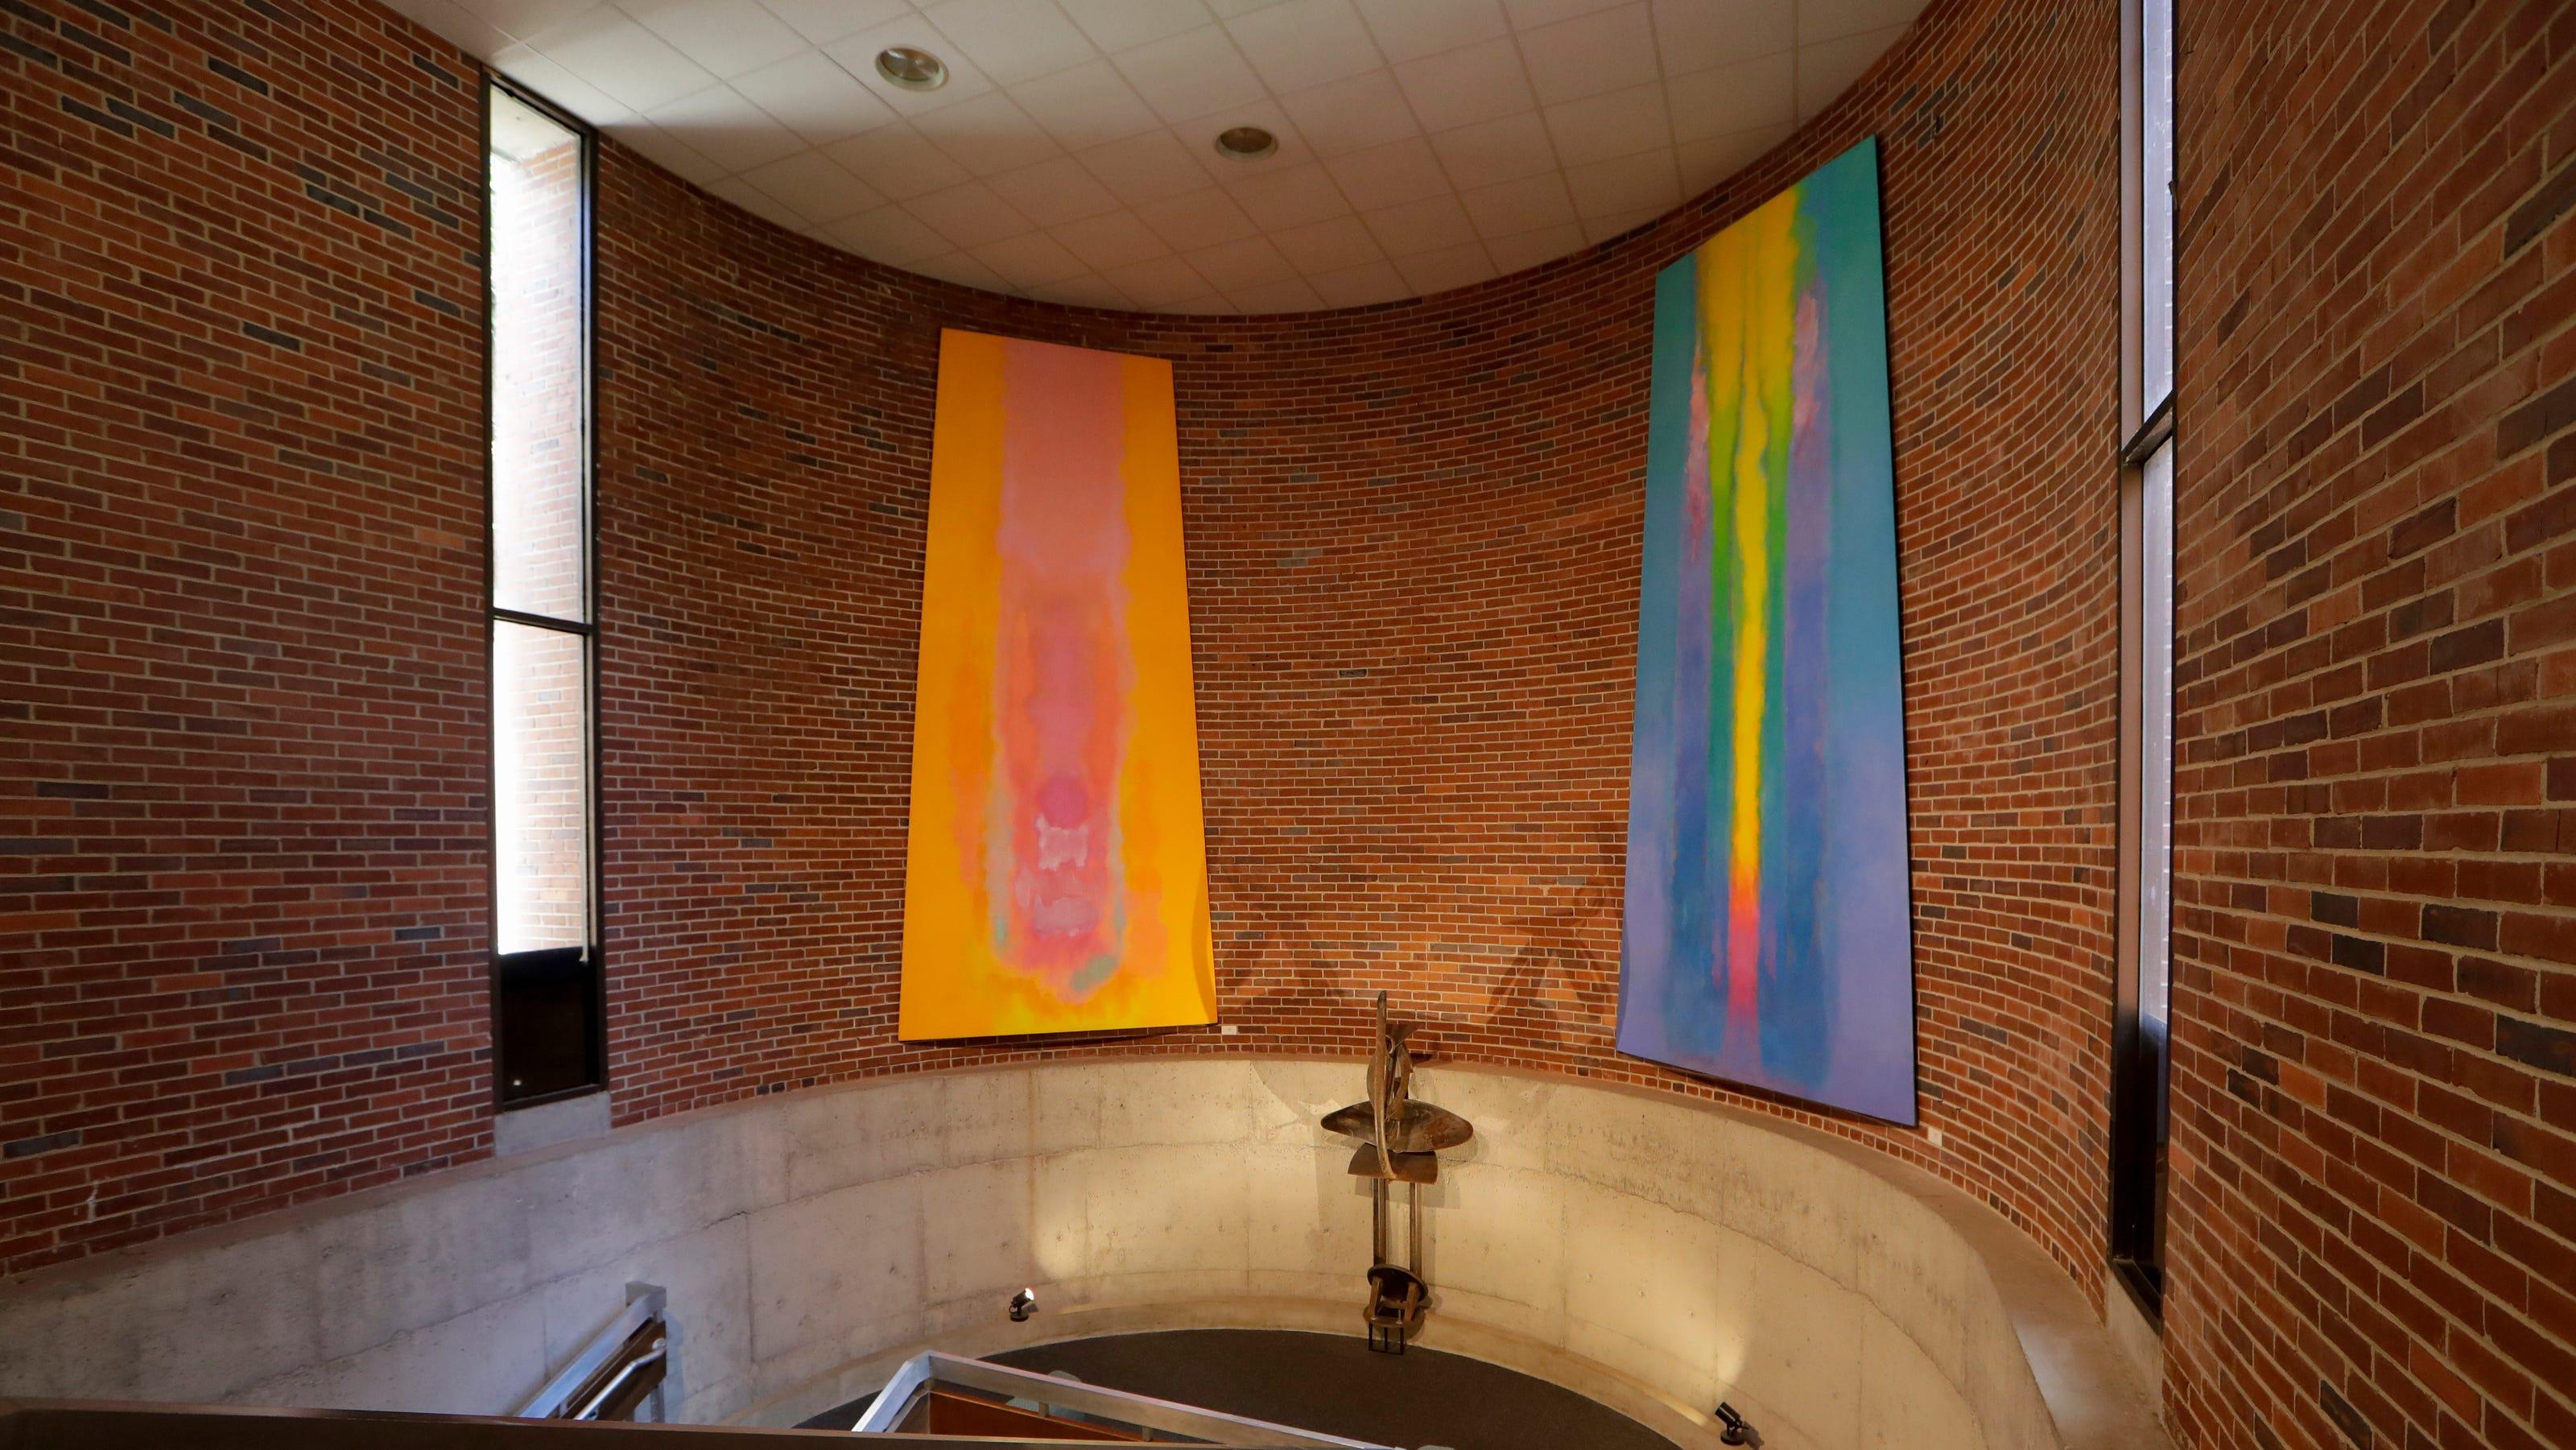 Fsu S Mofa At Home Delivers Digital Art Projects